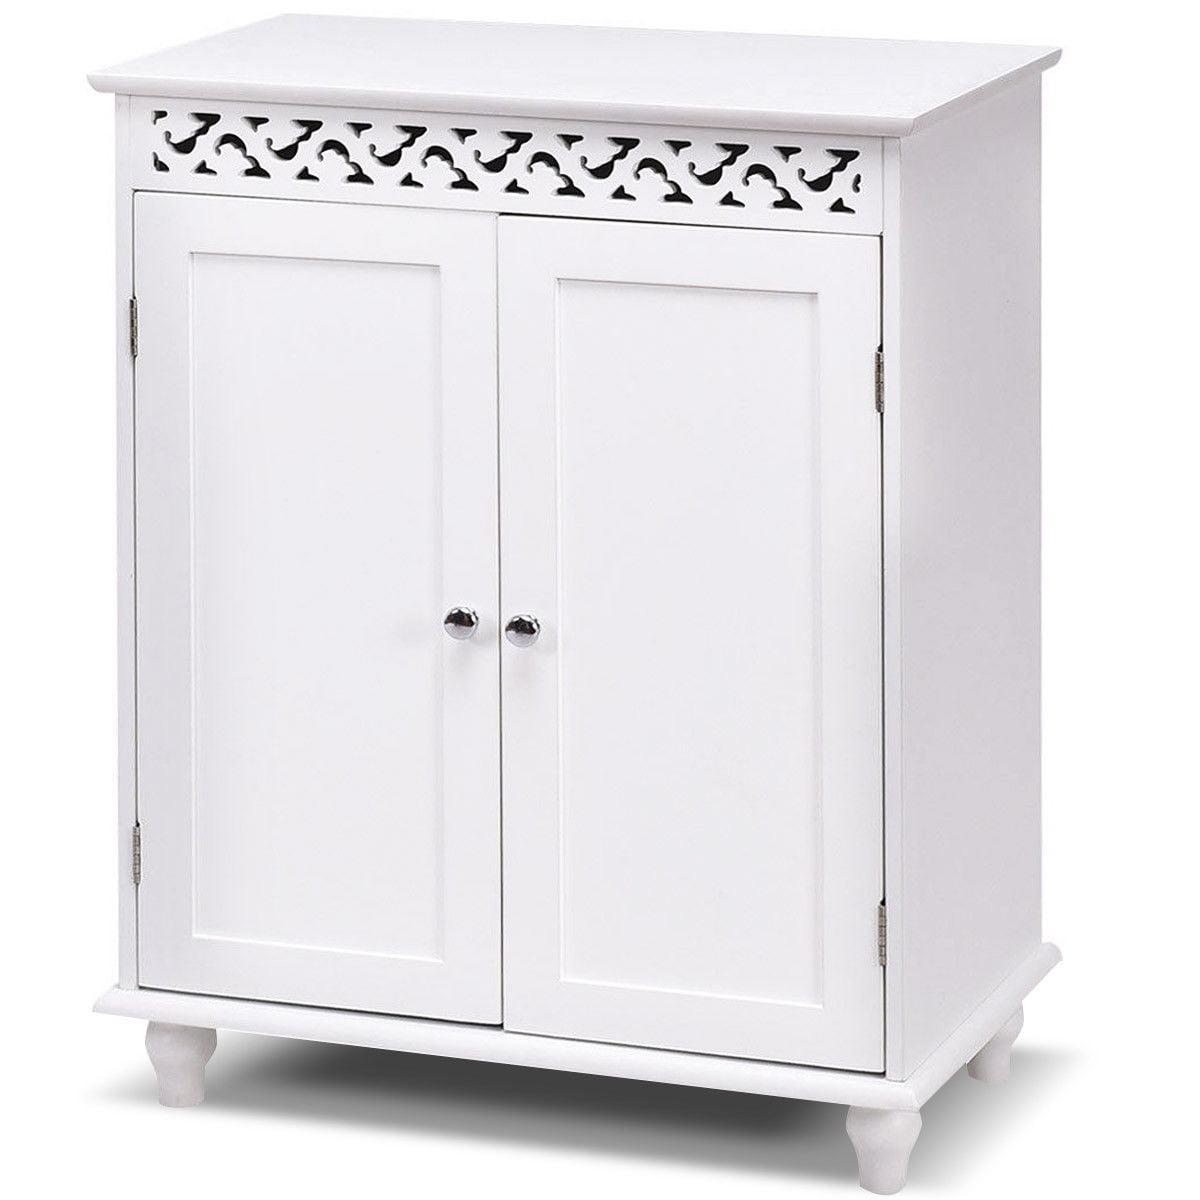 Bathroom Cabinet Storage Shelves gymax white wooden 2 door bathroom cabinet storage cupboard 2